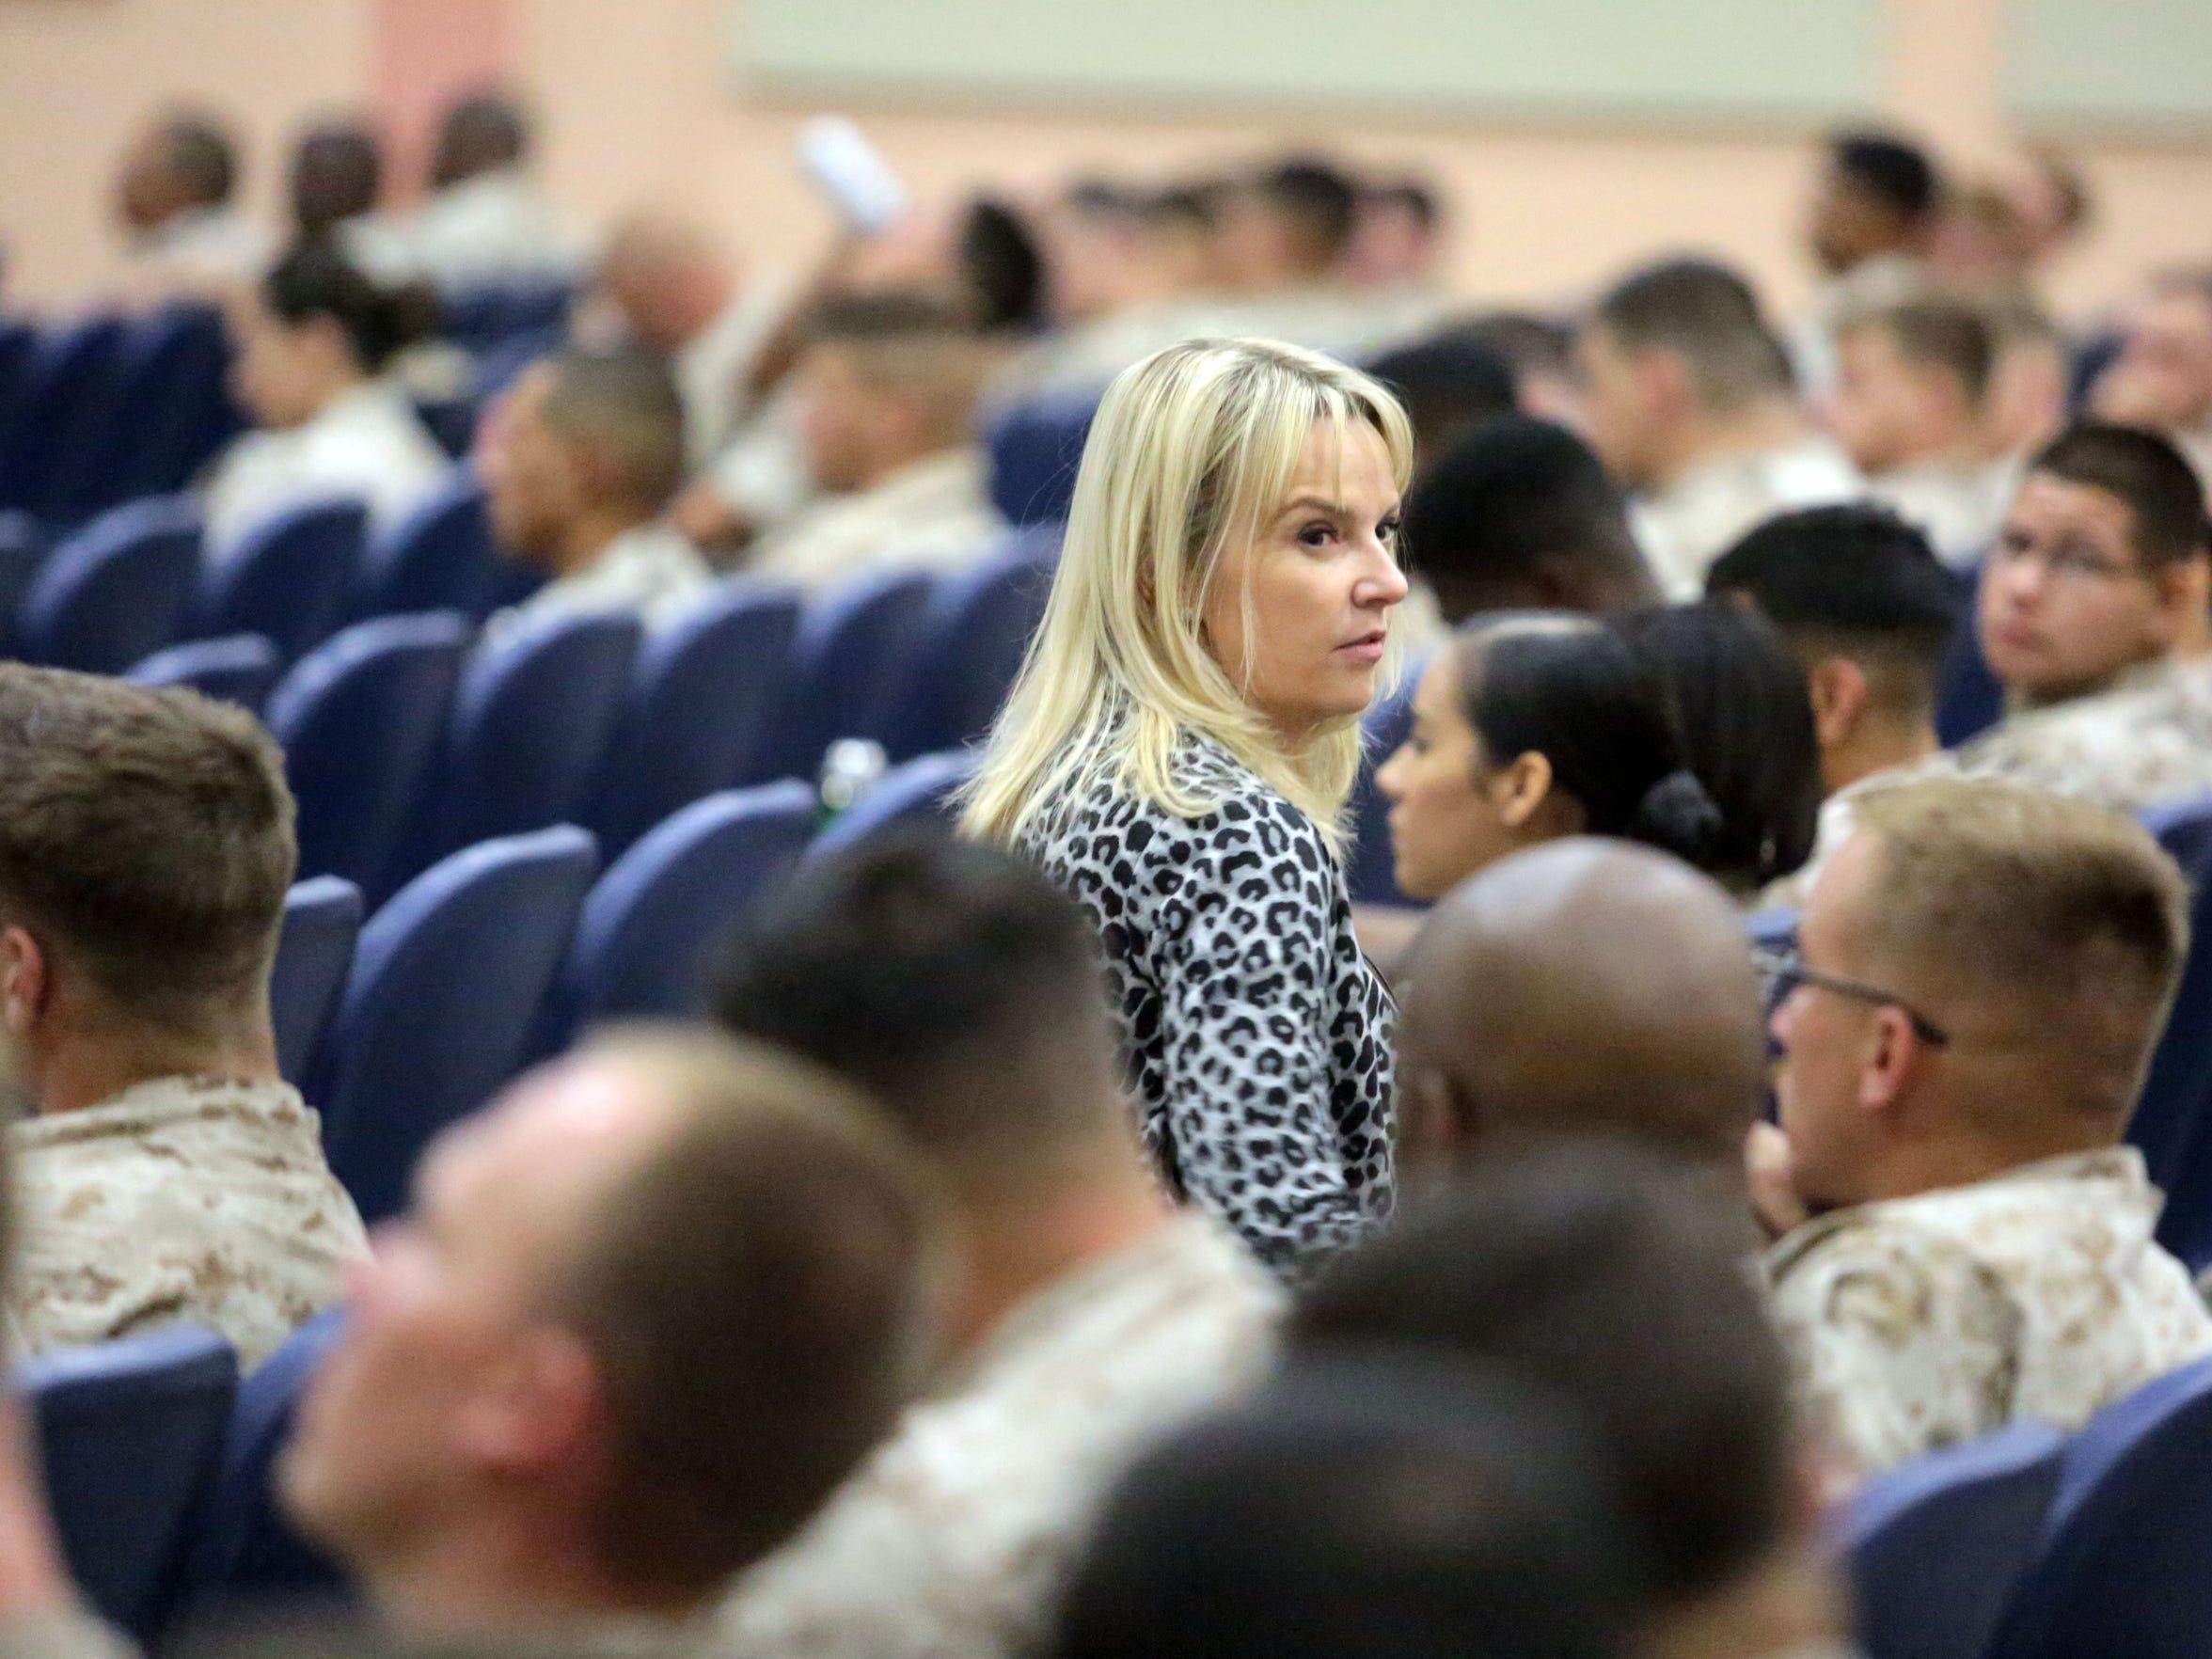 TDS Marine Briefing 0417018.JPG